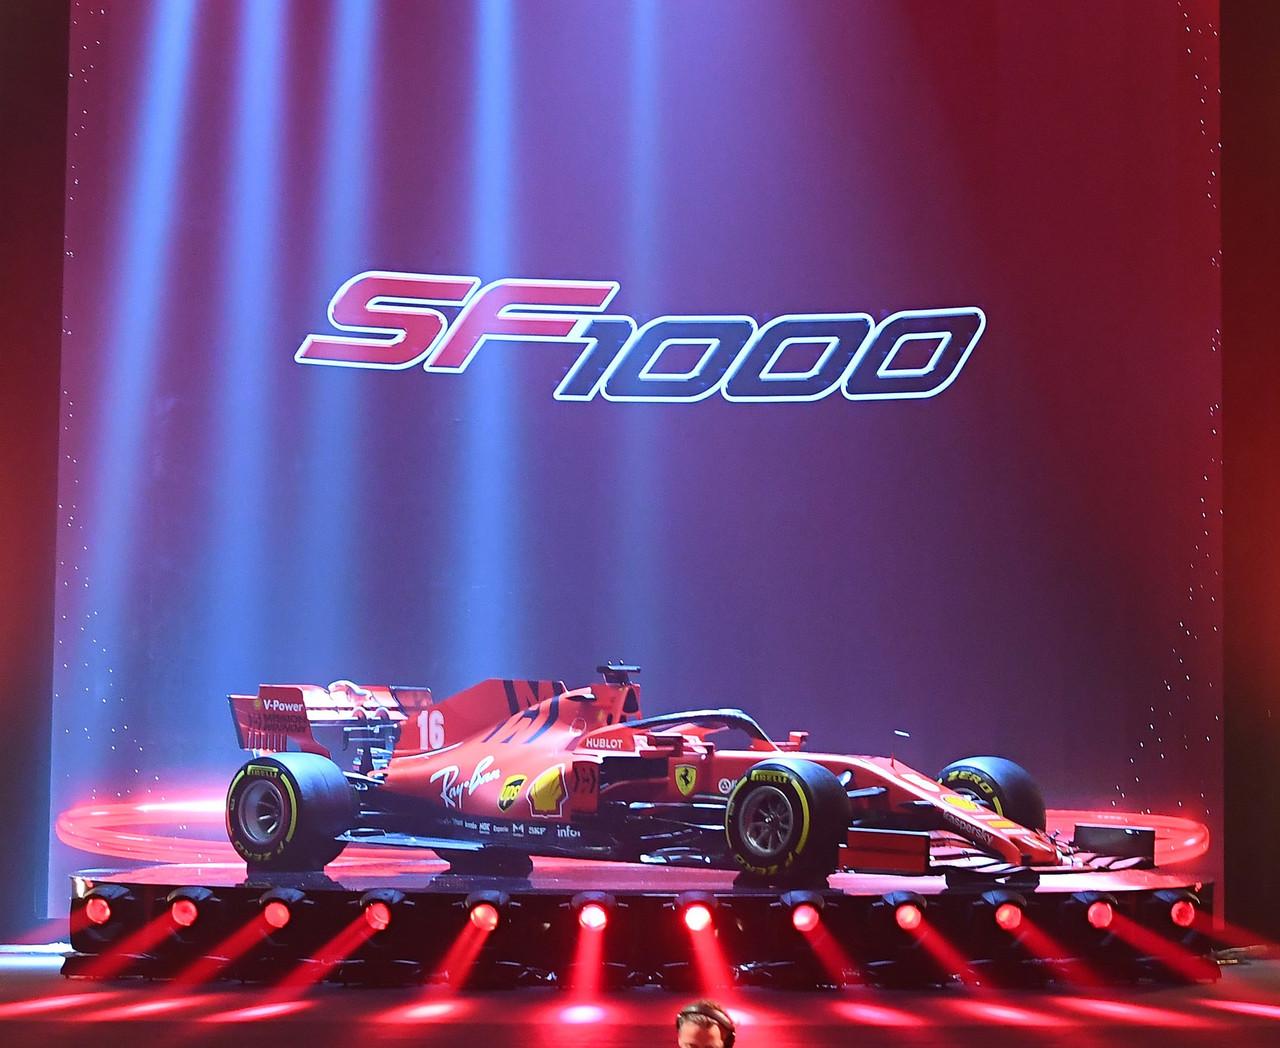 Ferrari presenta el coche para la temporada 2020